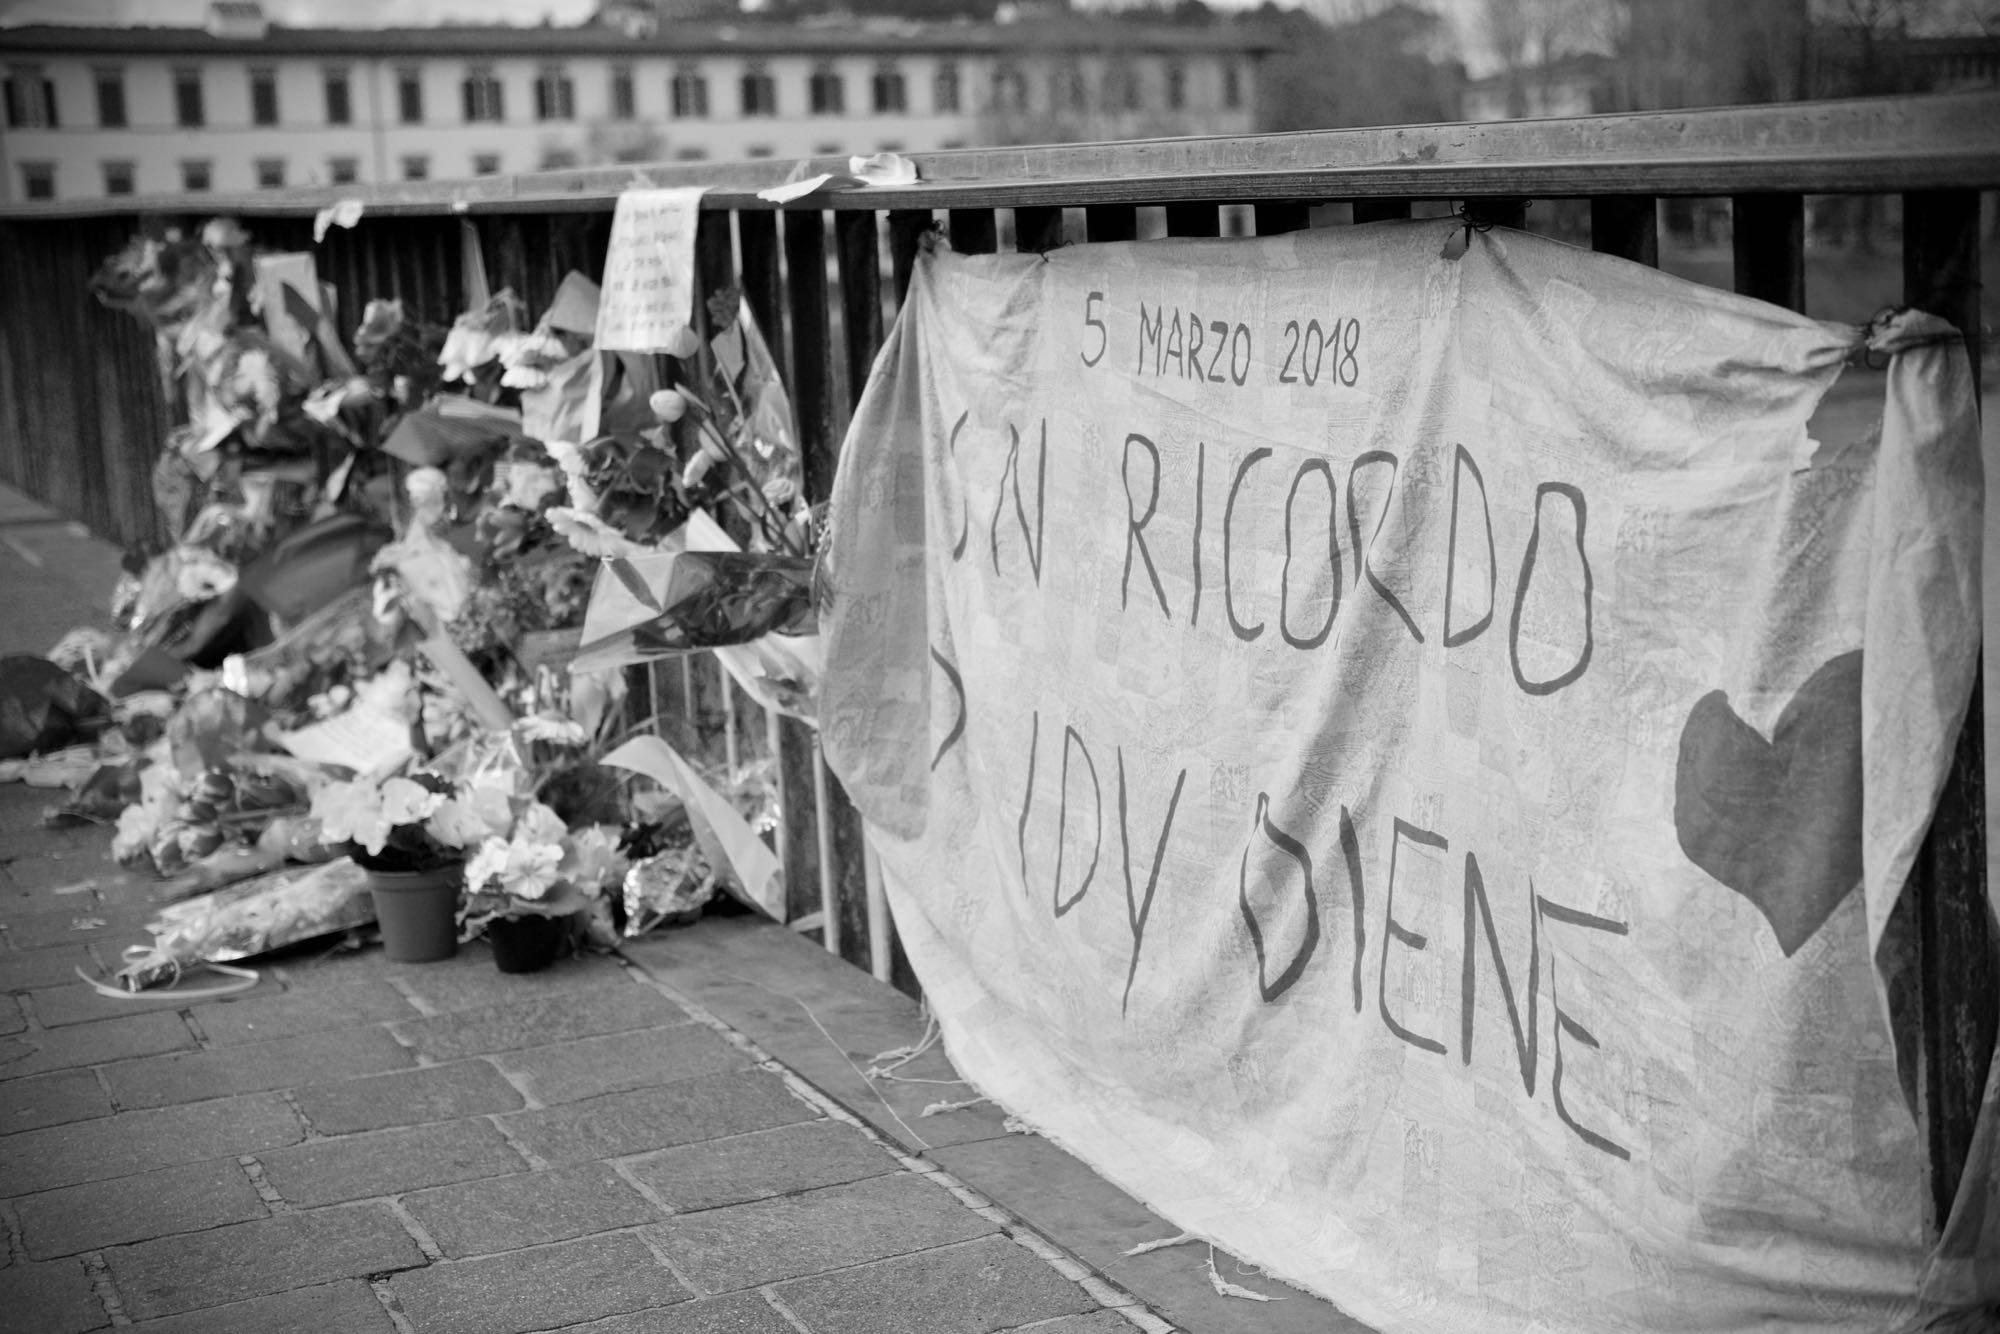 Massimiliano Scarpa photo